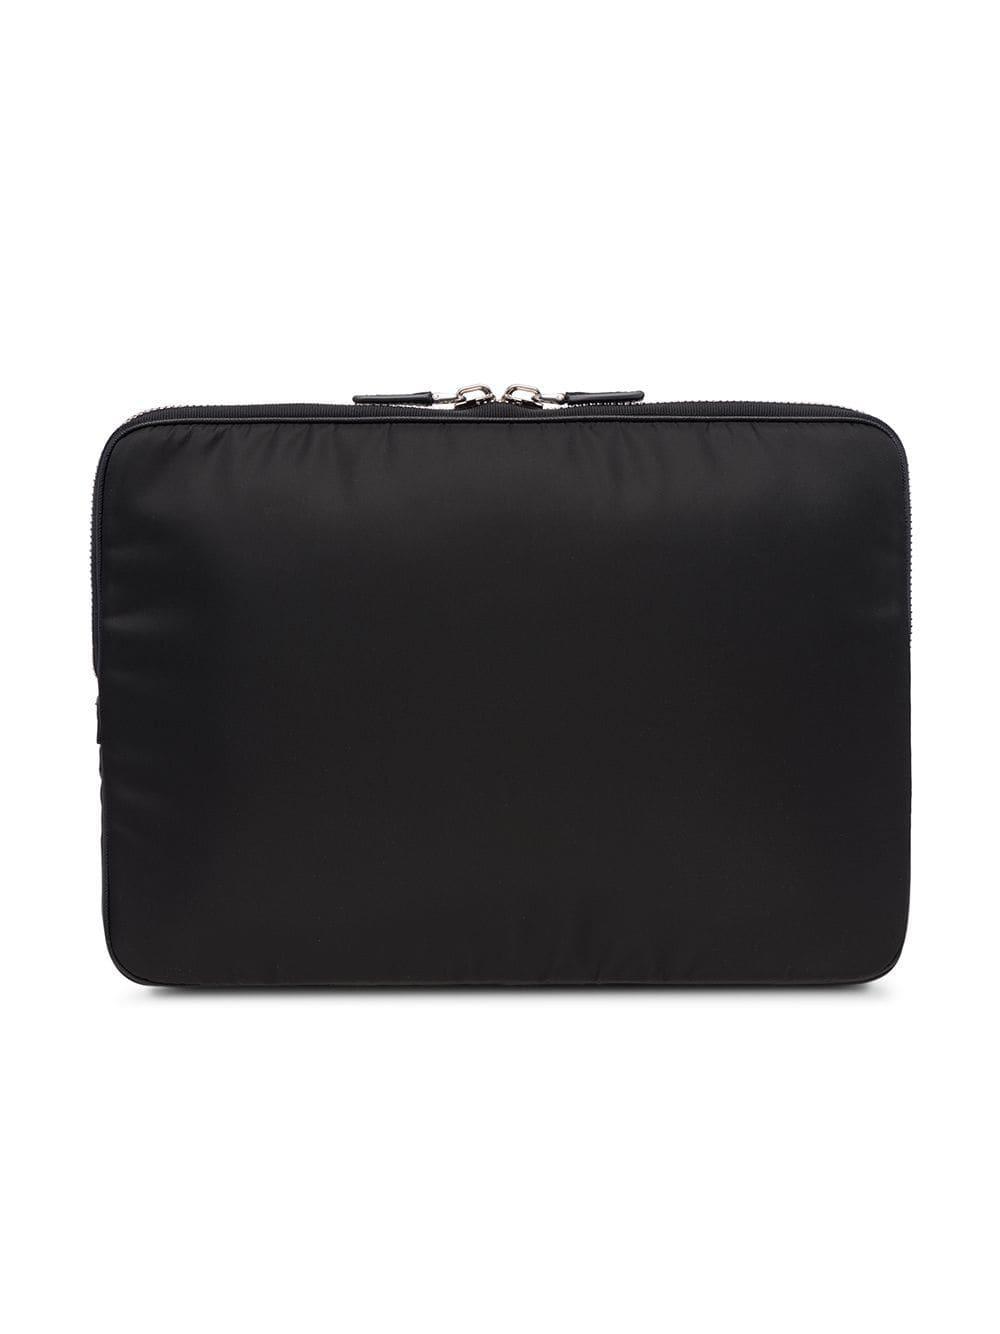 Prada - Black Saffiano Laptop Case for Men - Lyst. View fullscreen dd4400d87c